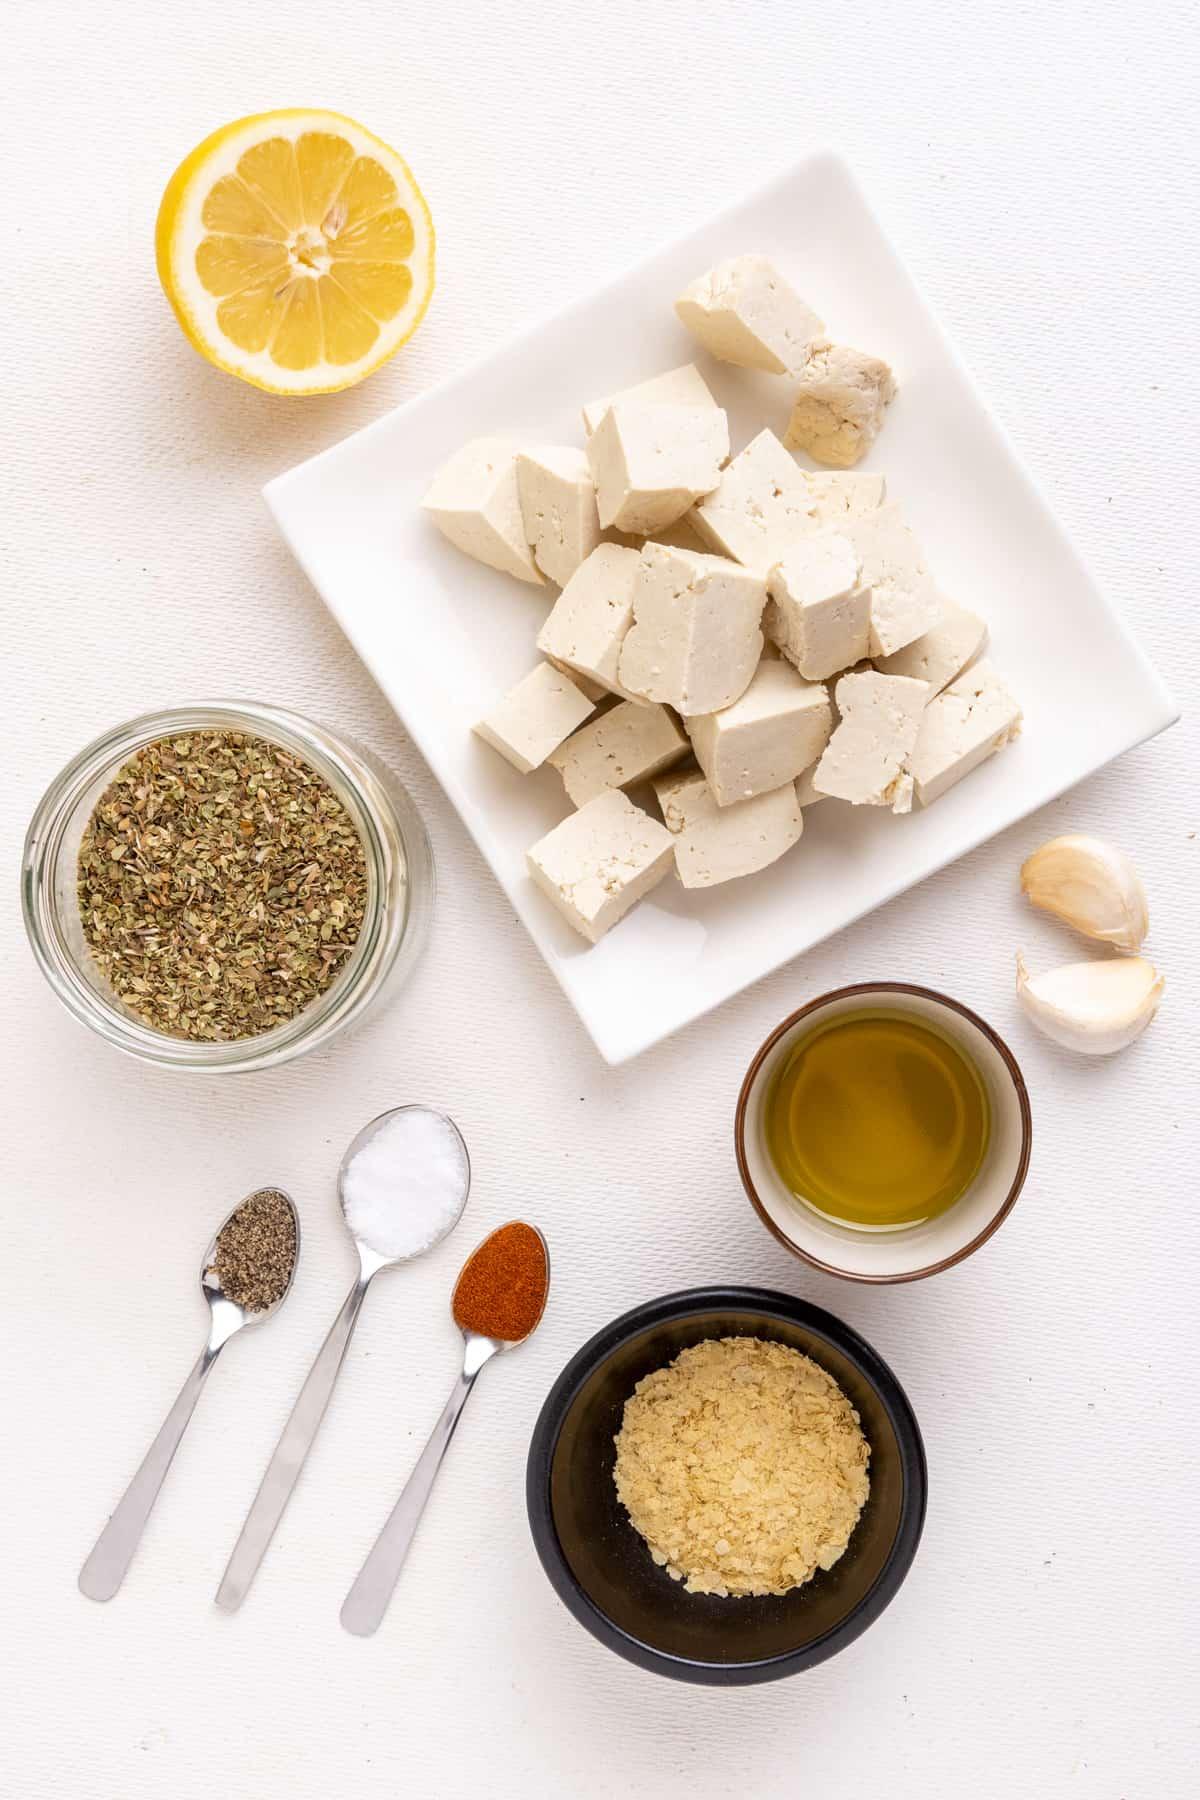 The ingredients for vegan souvlaki: Cubed firm tofu, olive oil, a half lemon, oregano, fresh garlic, salt, pepper, paprika and nutritional yeast.